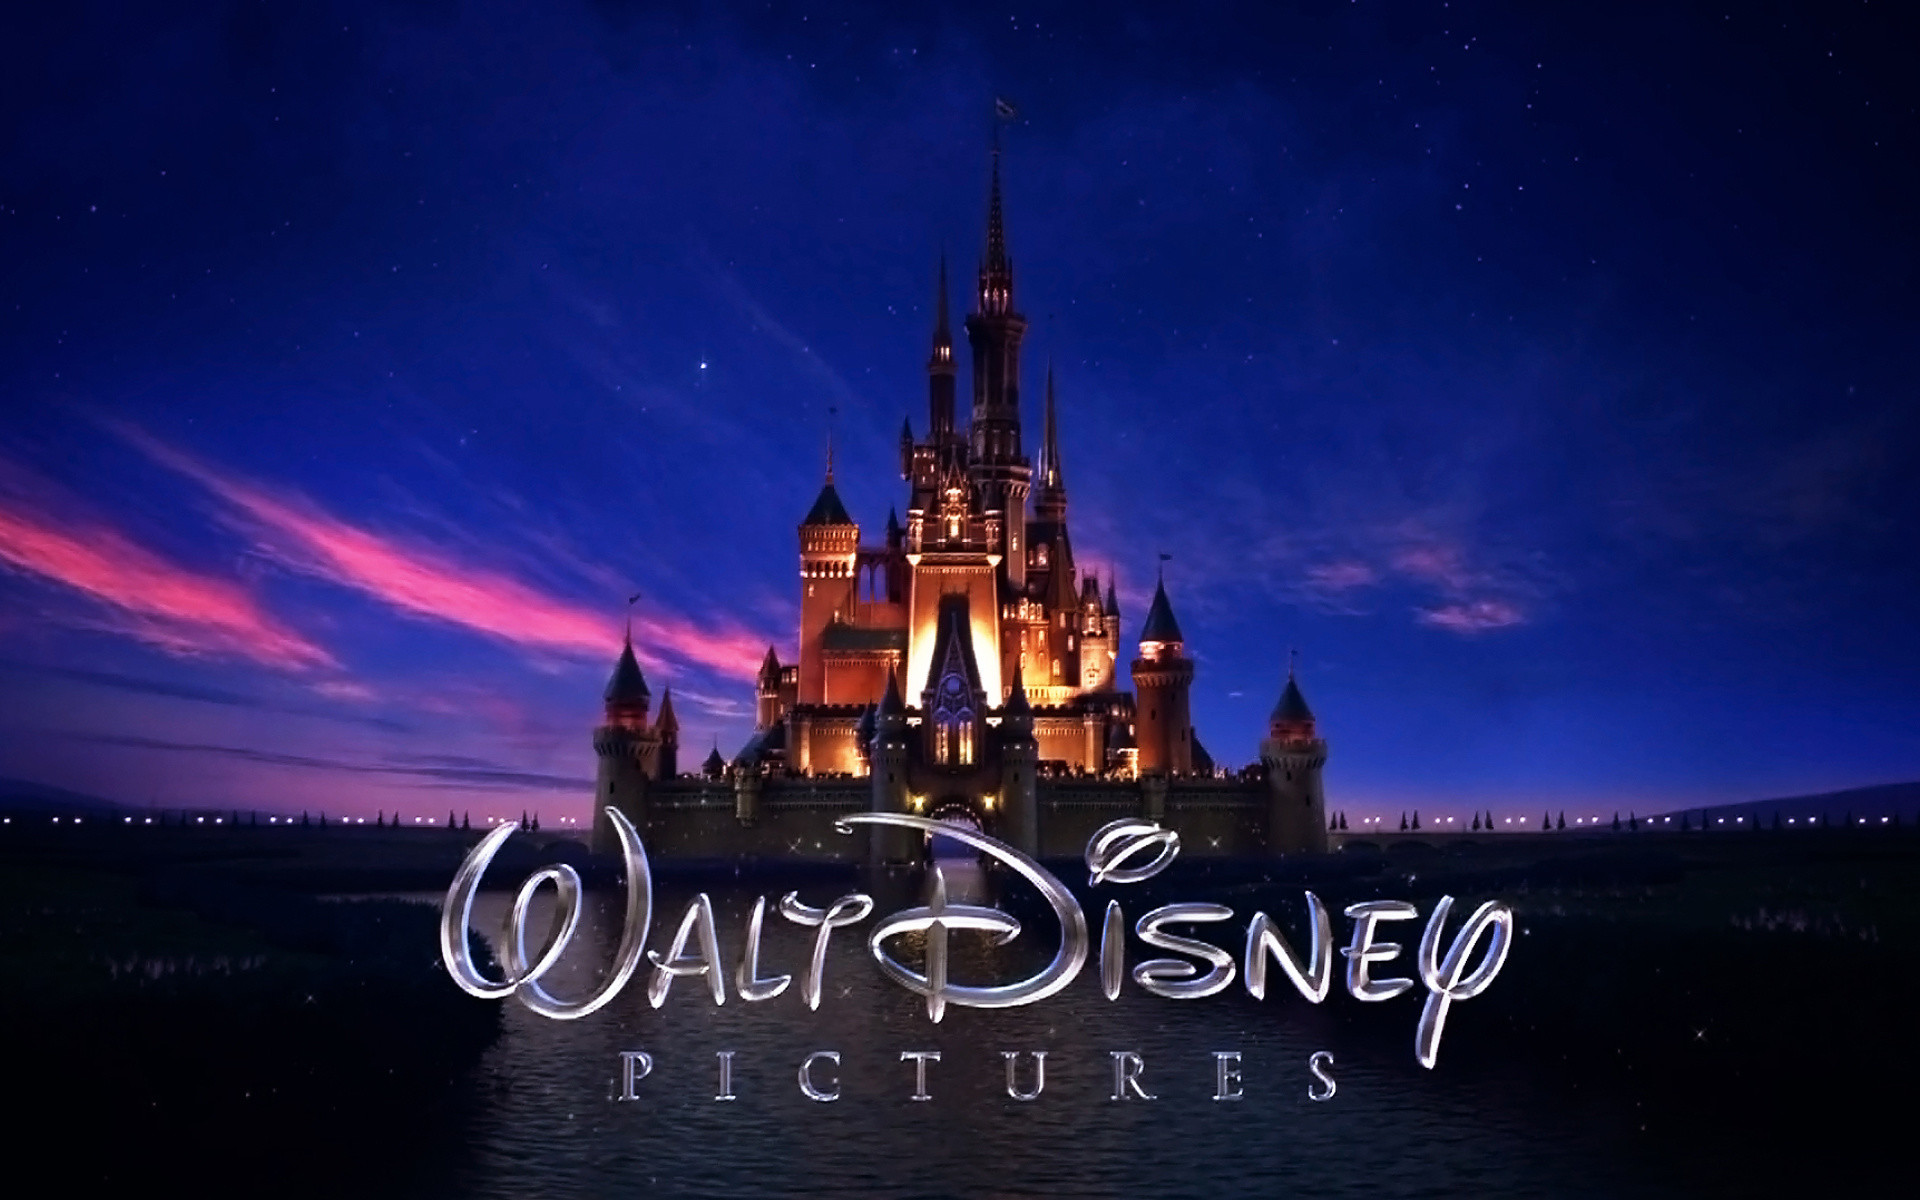 walt disney, logo, castle wallpapers, pictures, free download .